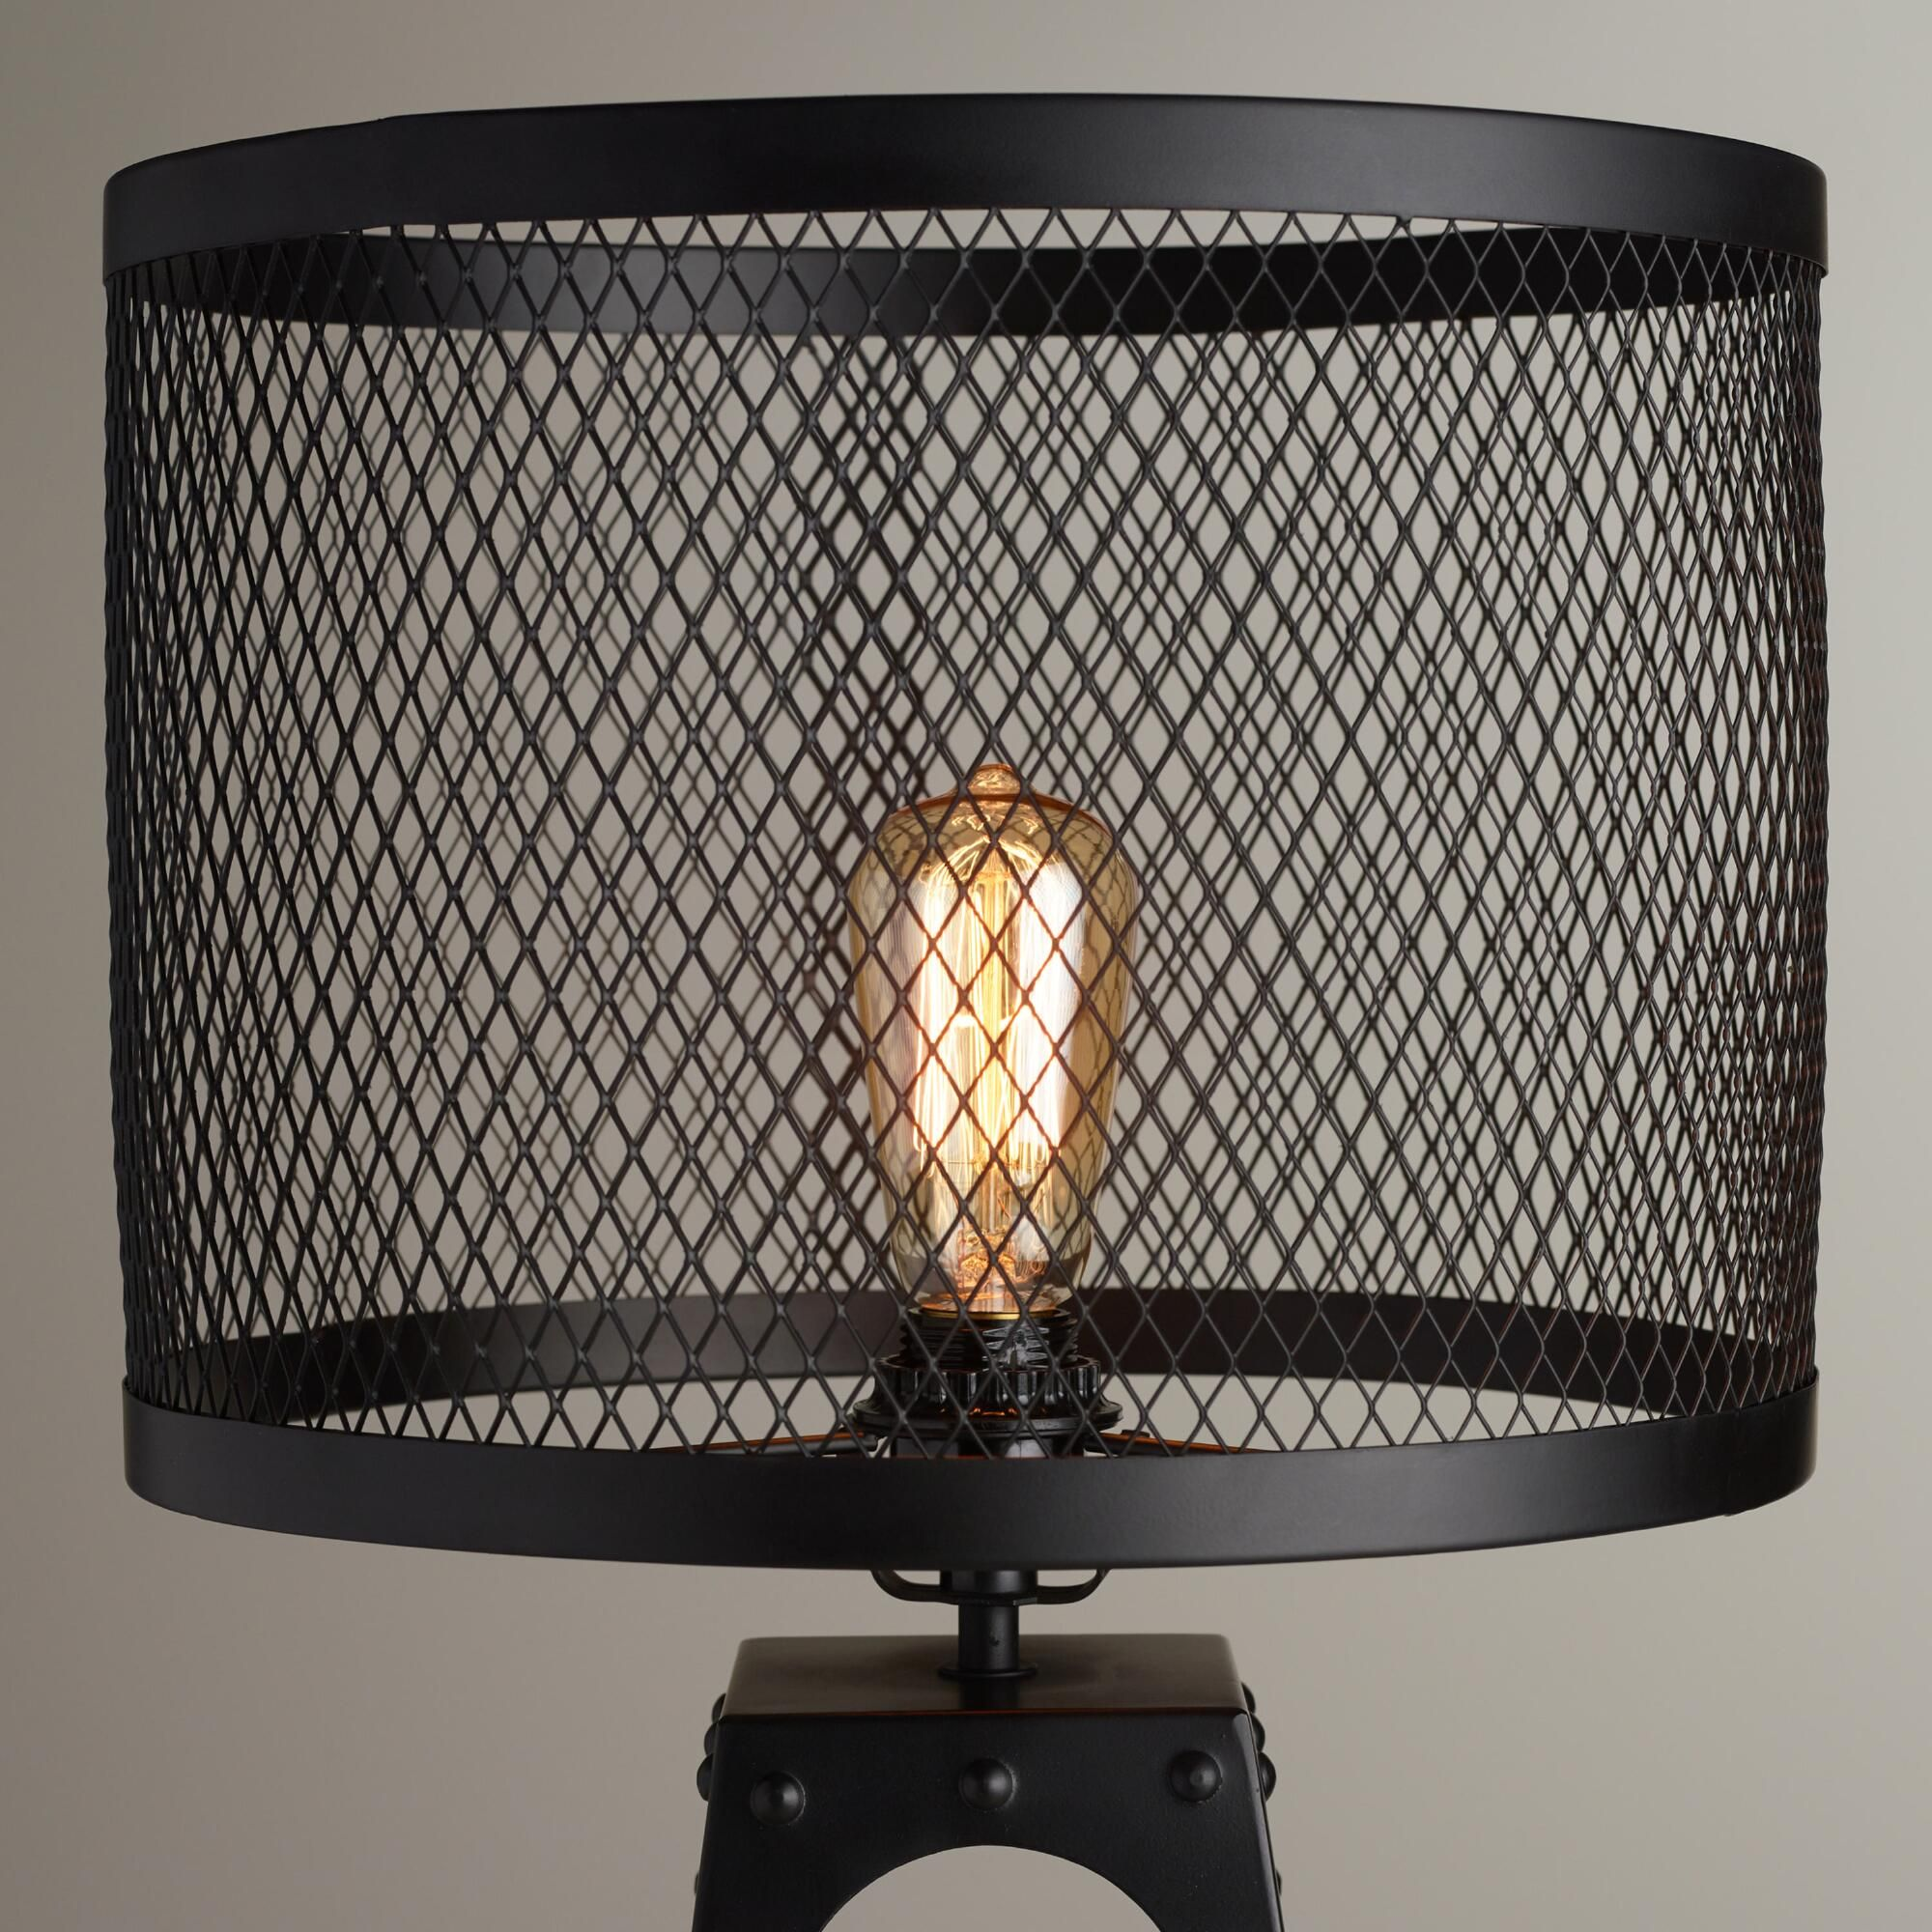 Riveted Table Lamp Shade Metal Lamp Shade Table Lamp Shades Lamp Shade